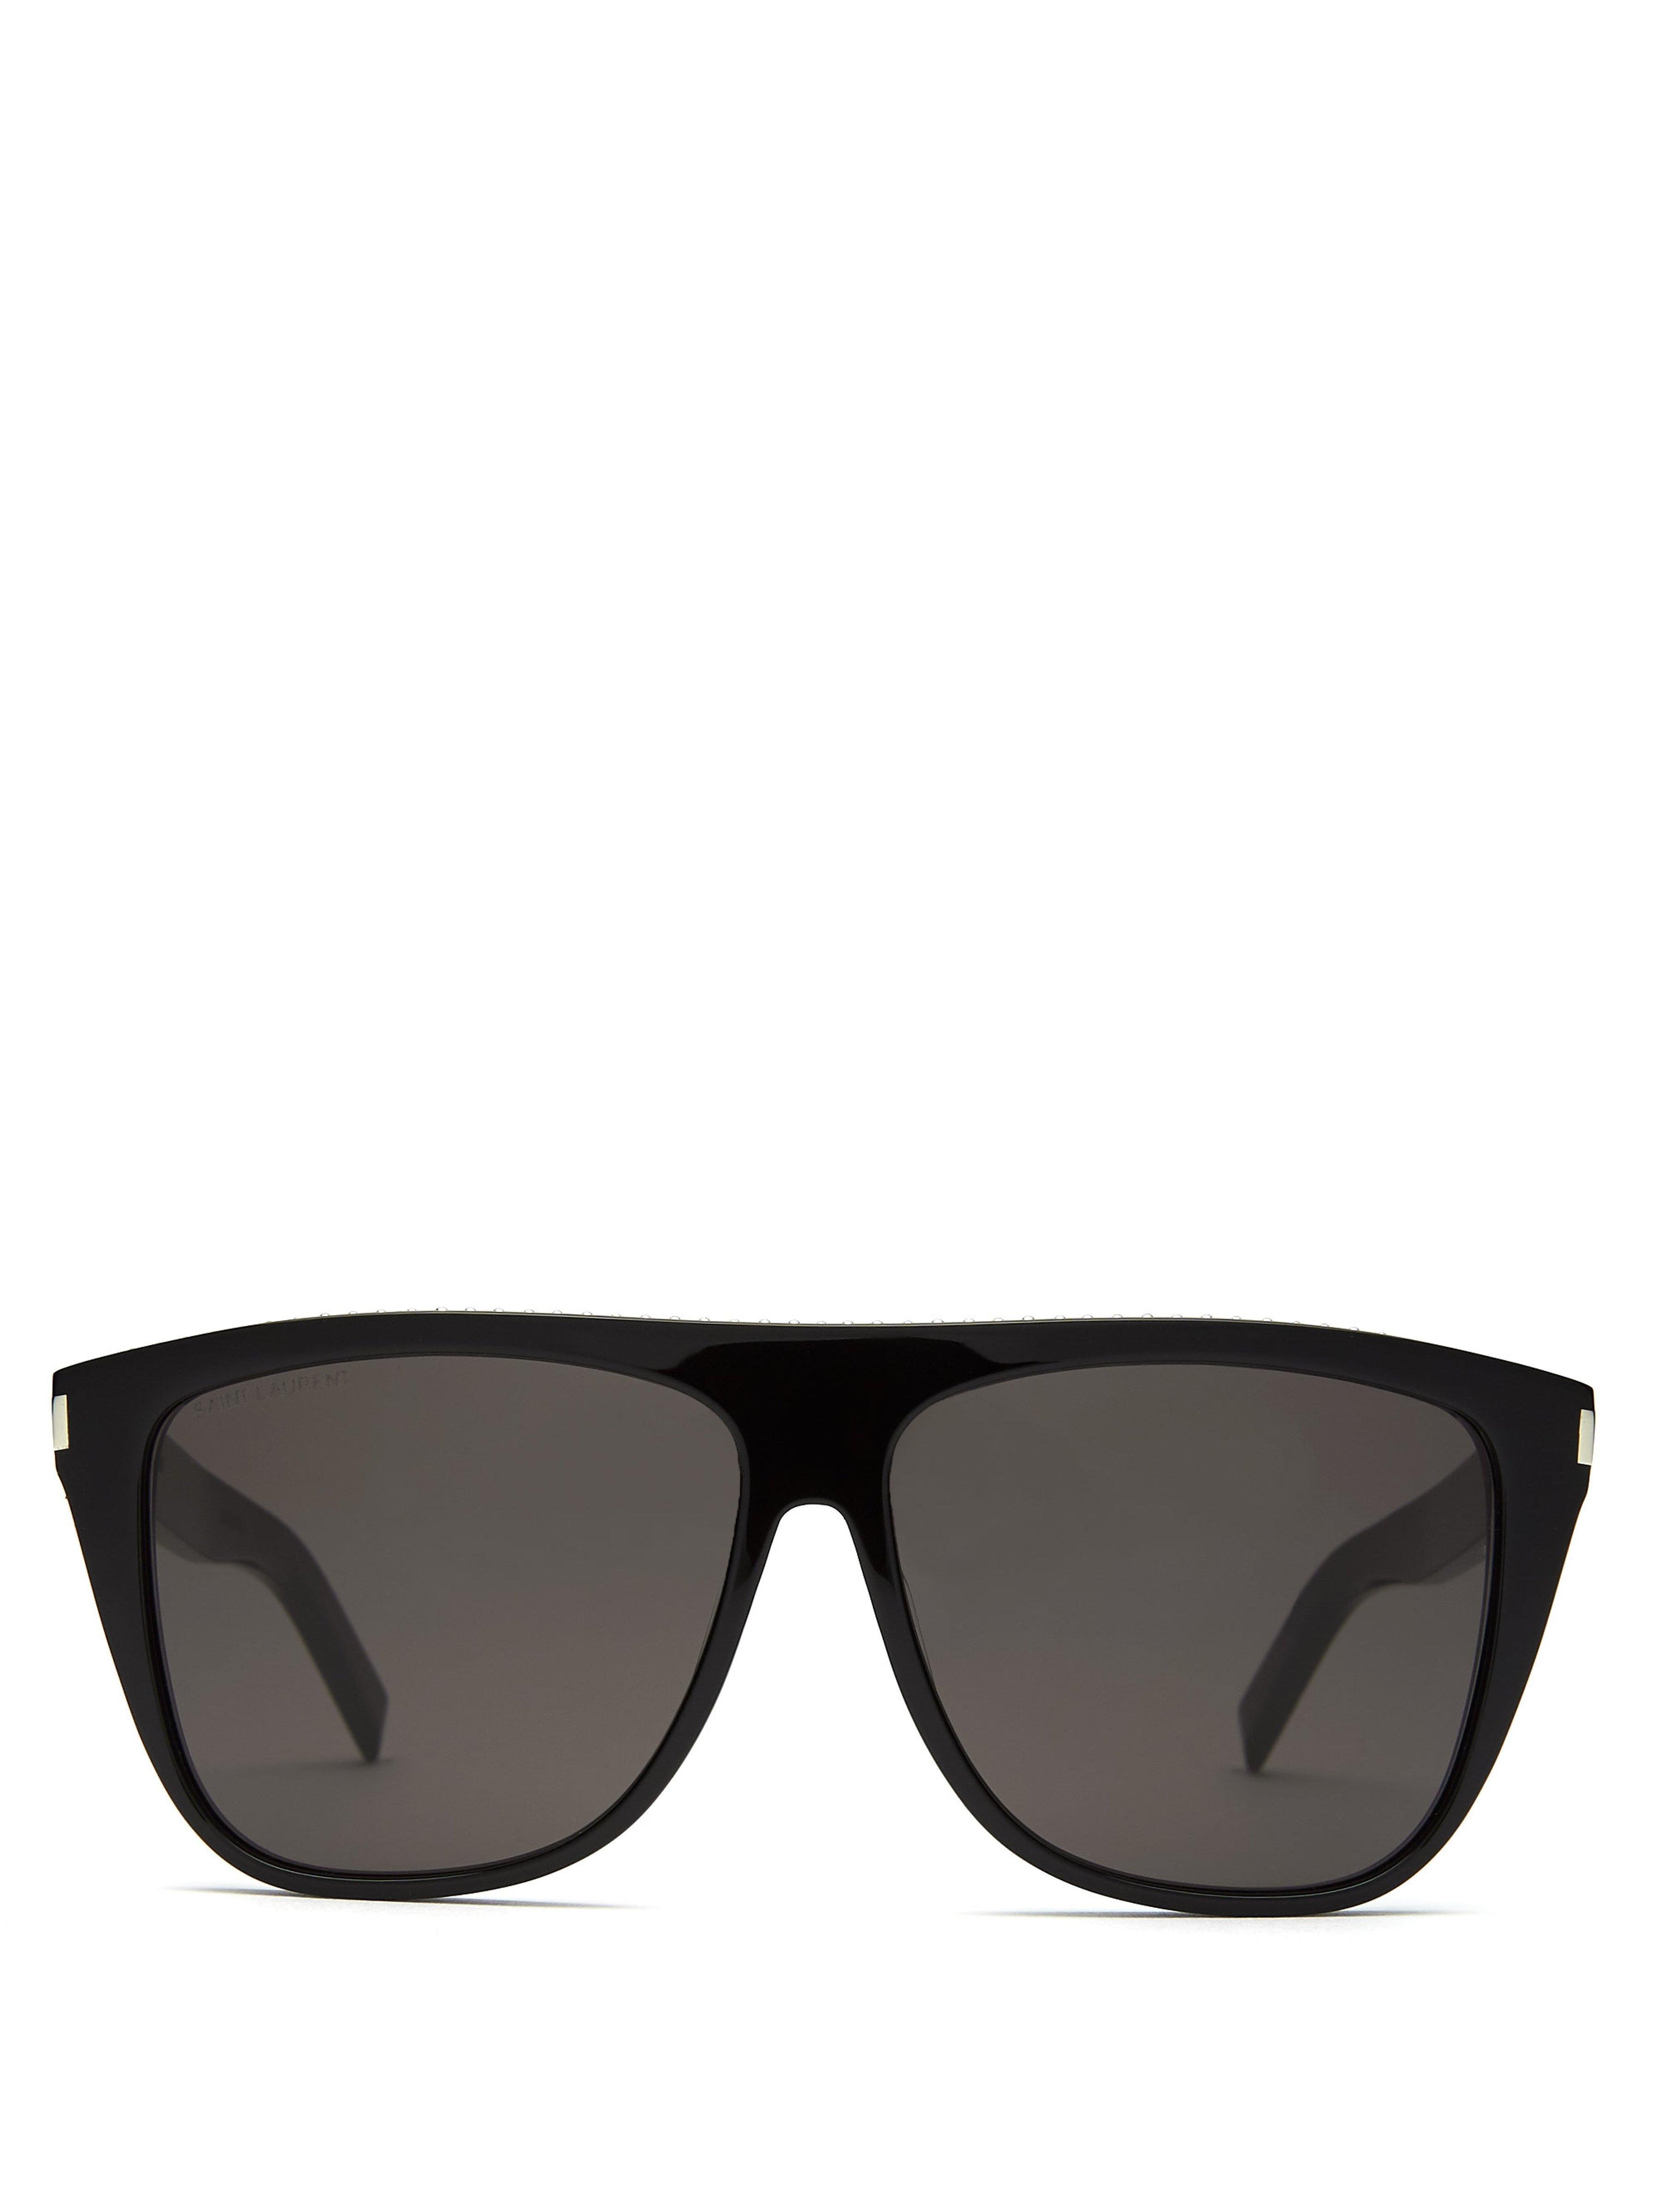 8cabff137b Saint Laurent D Frame Studded Acetate Sunglasses in Black for Men - Lyst